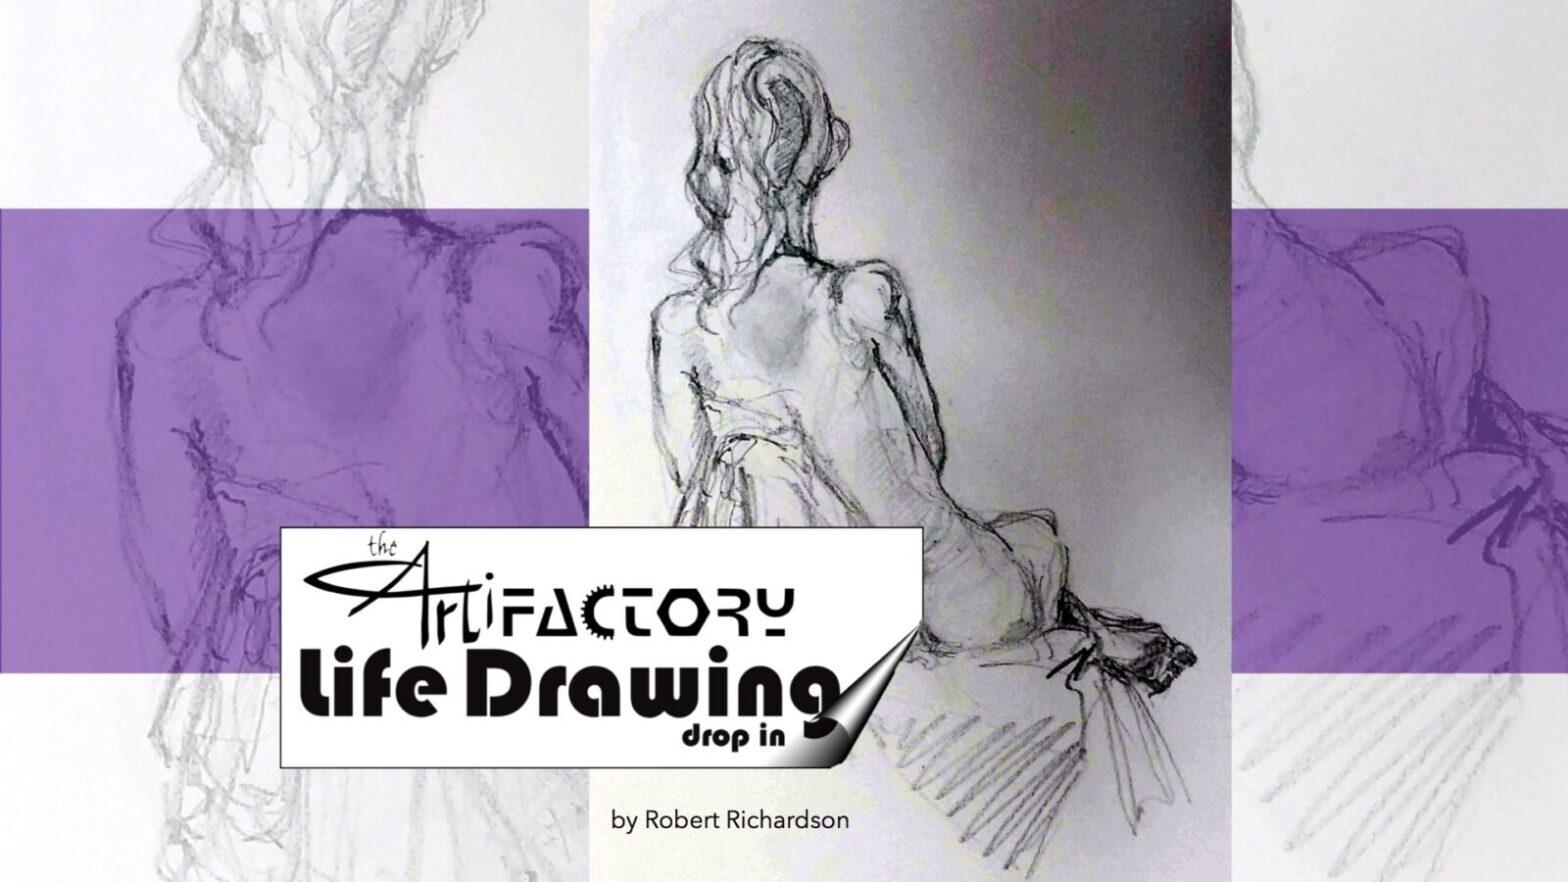 September Life Drawing